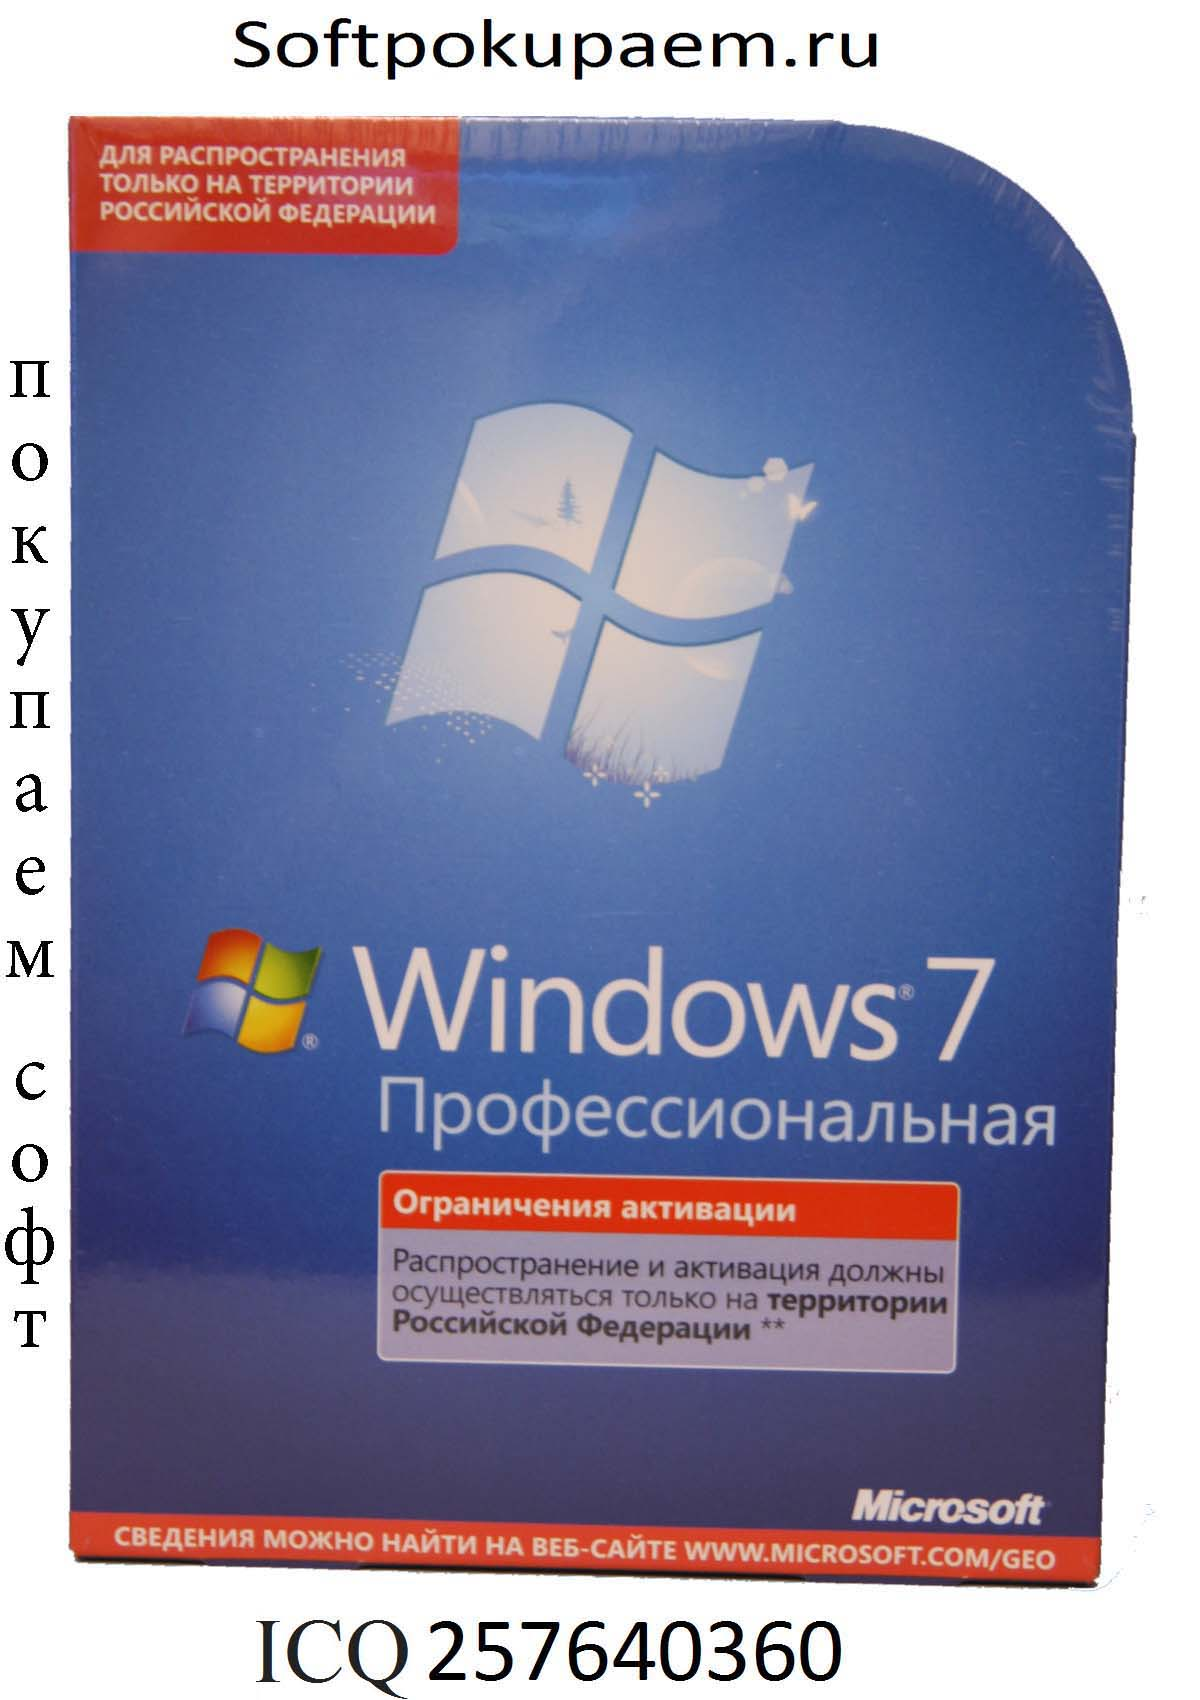 Microsoft (Майкрософт) купим Windows, Office, Server